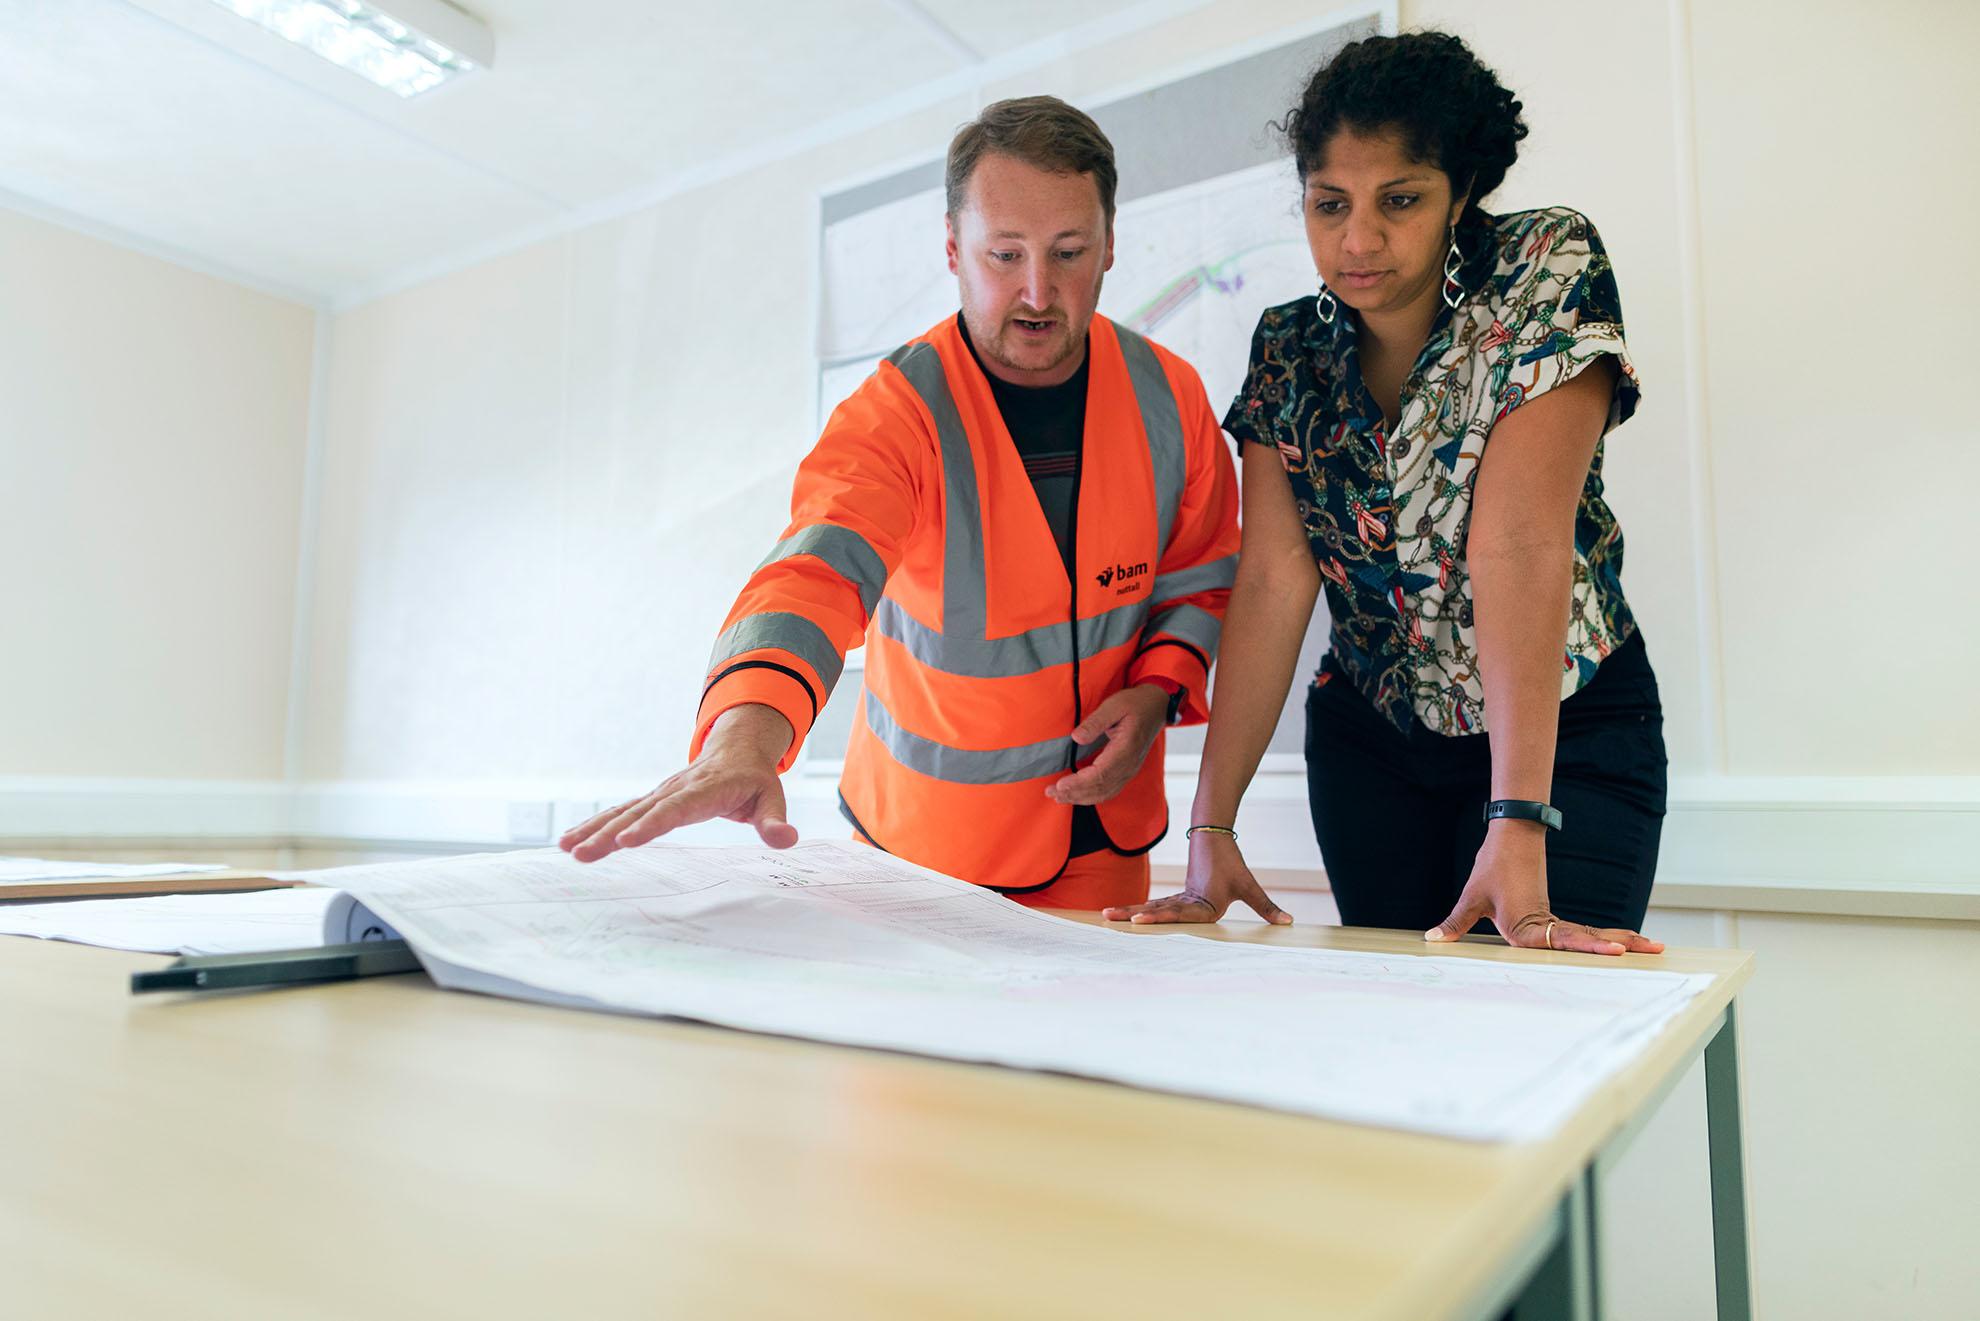 Project Management Industries